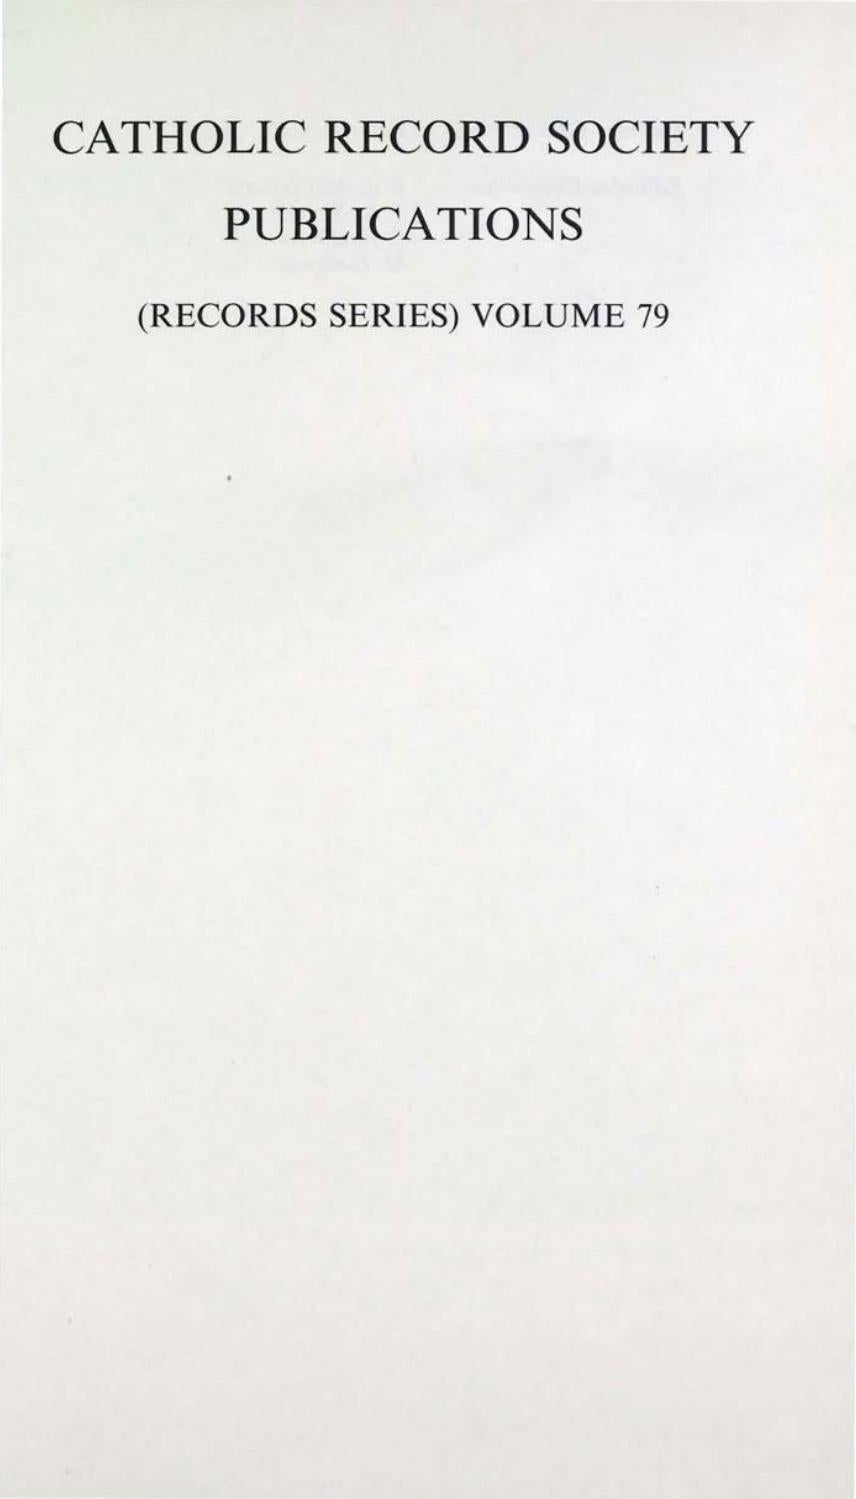 The Printer/'s Devil 98-99 Fetter Lane 1973 Pub Card Holbourne London